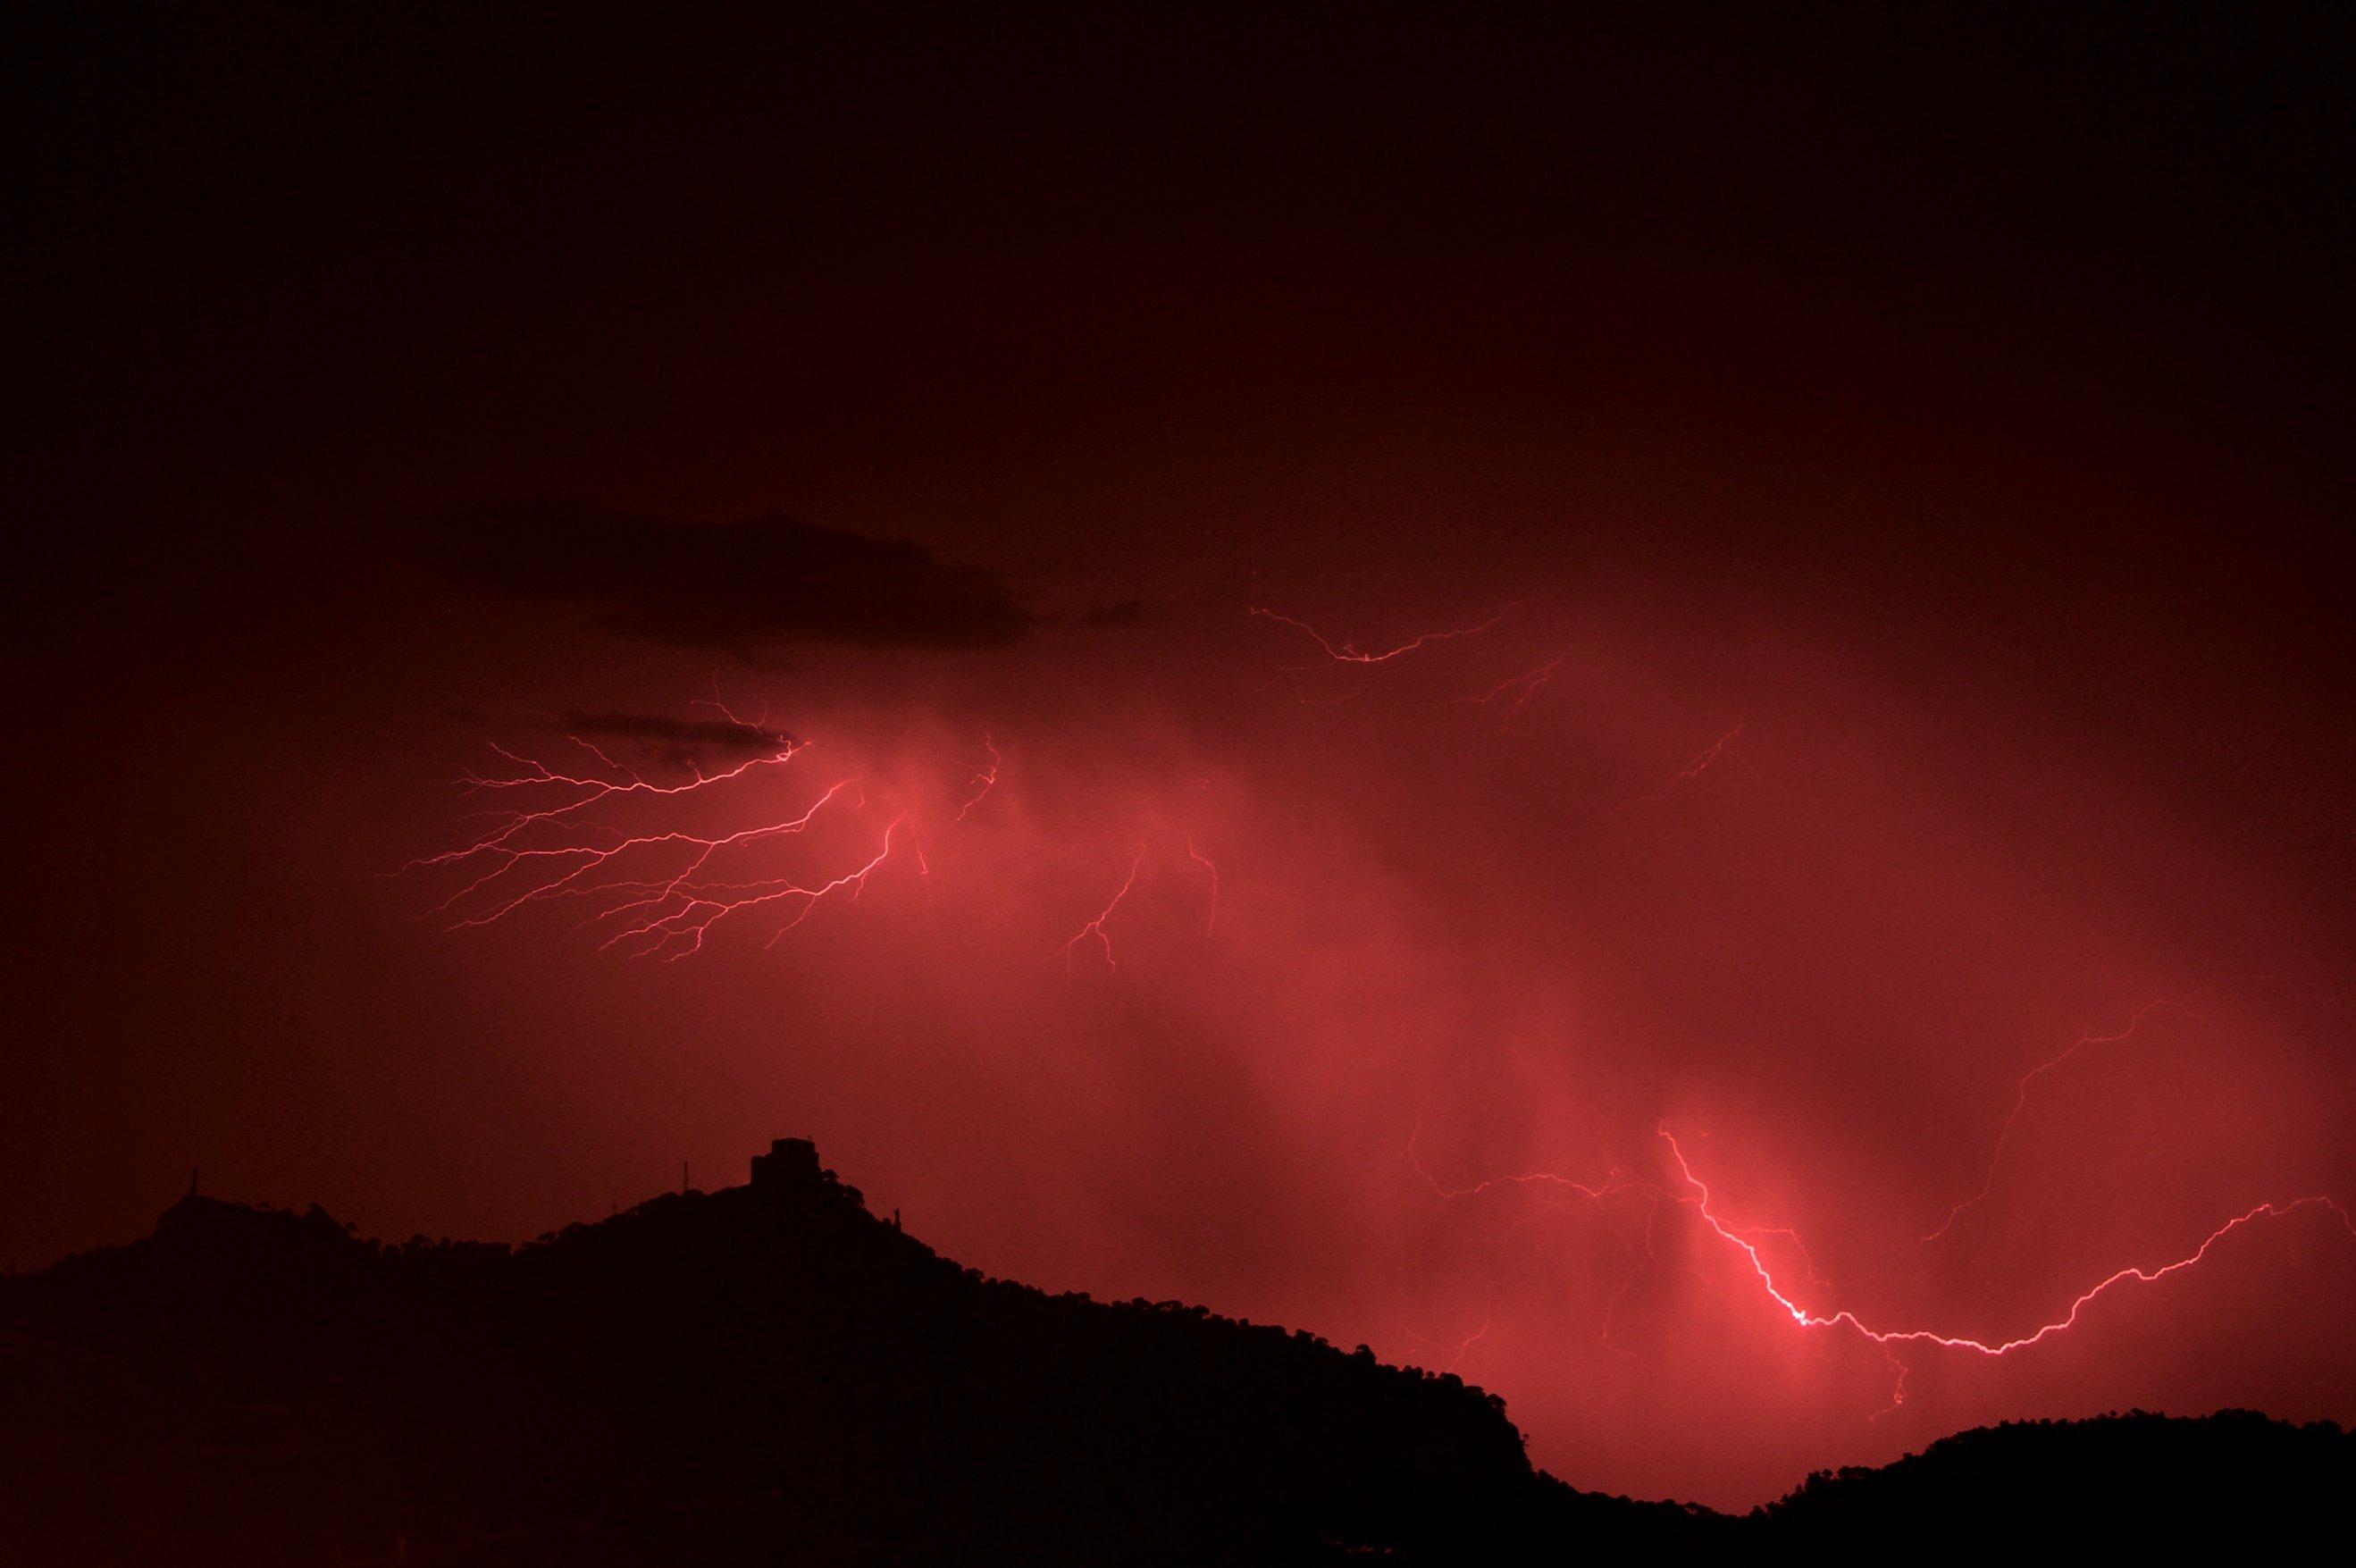 Red Lightning Fsu Wallpaper The Hippest Pics